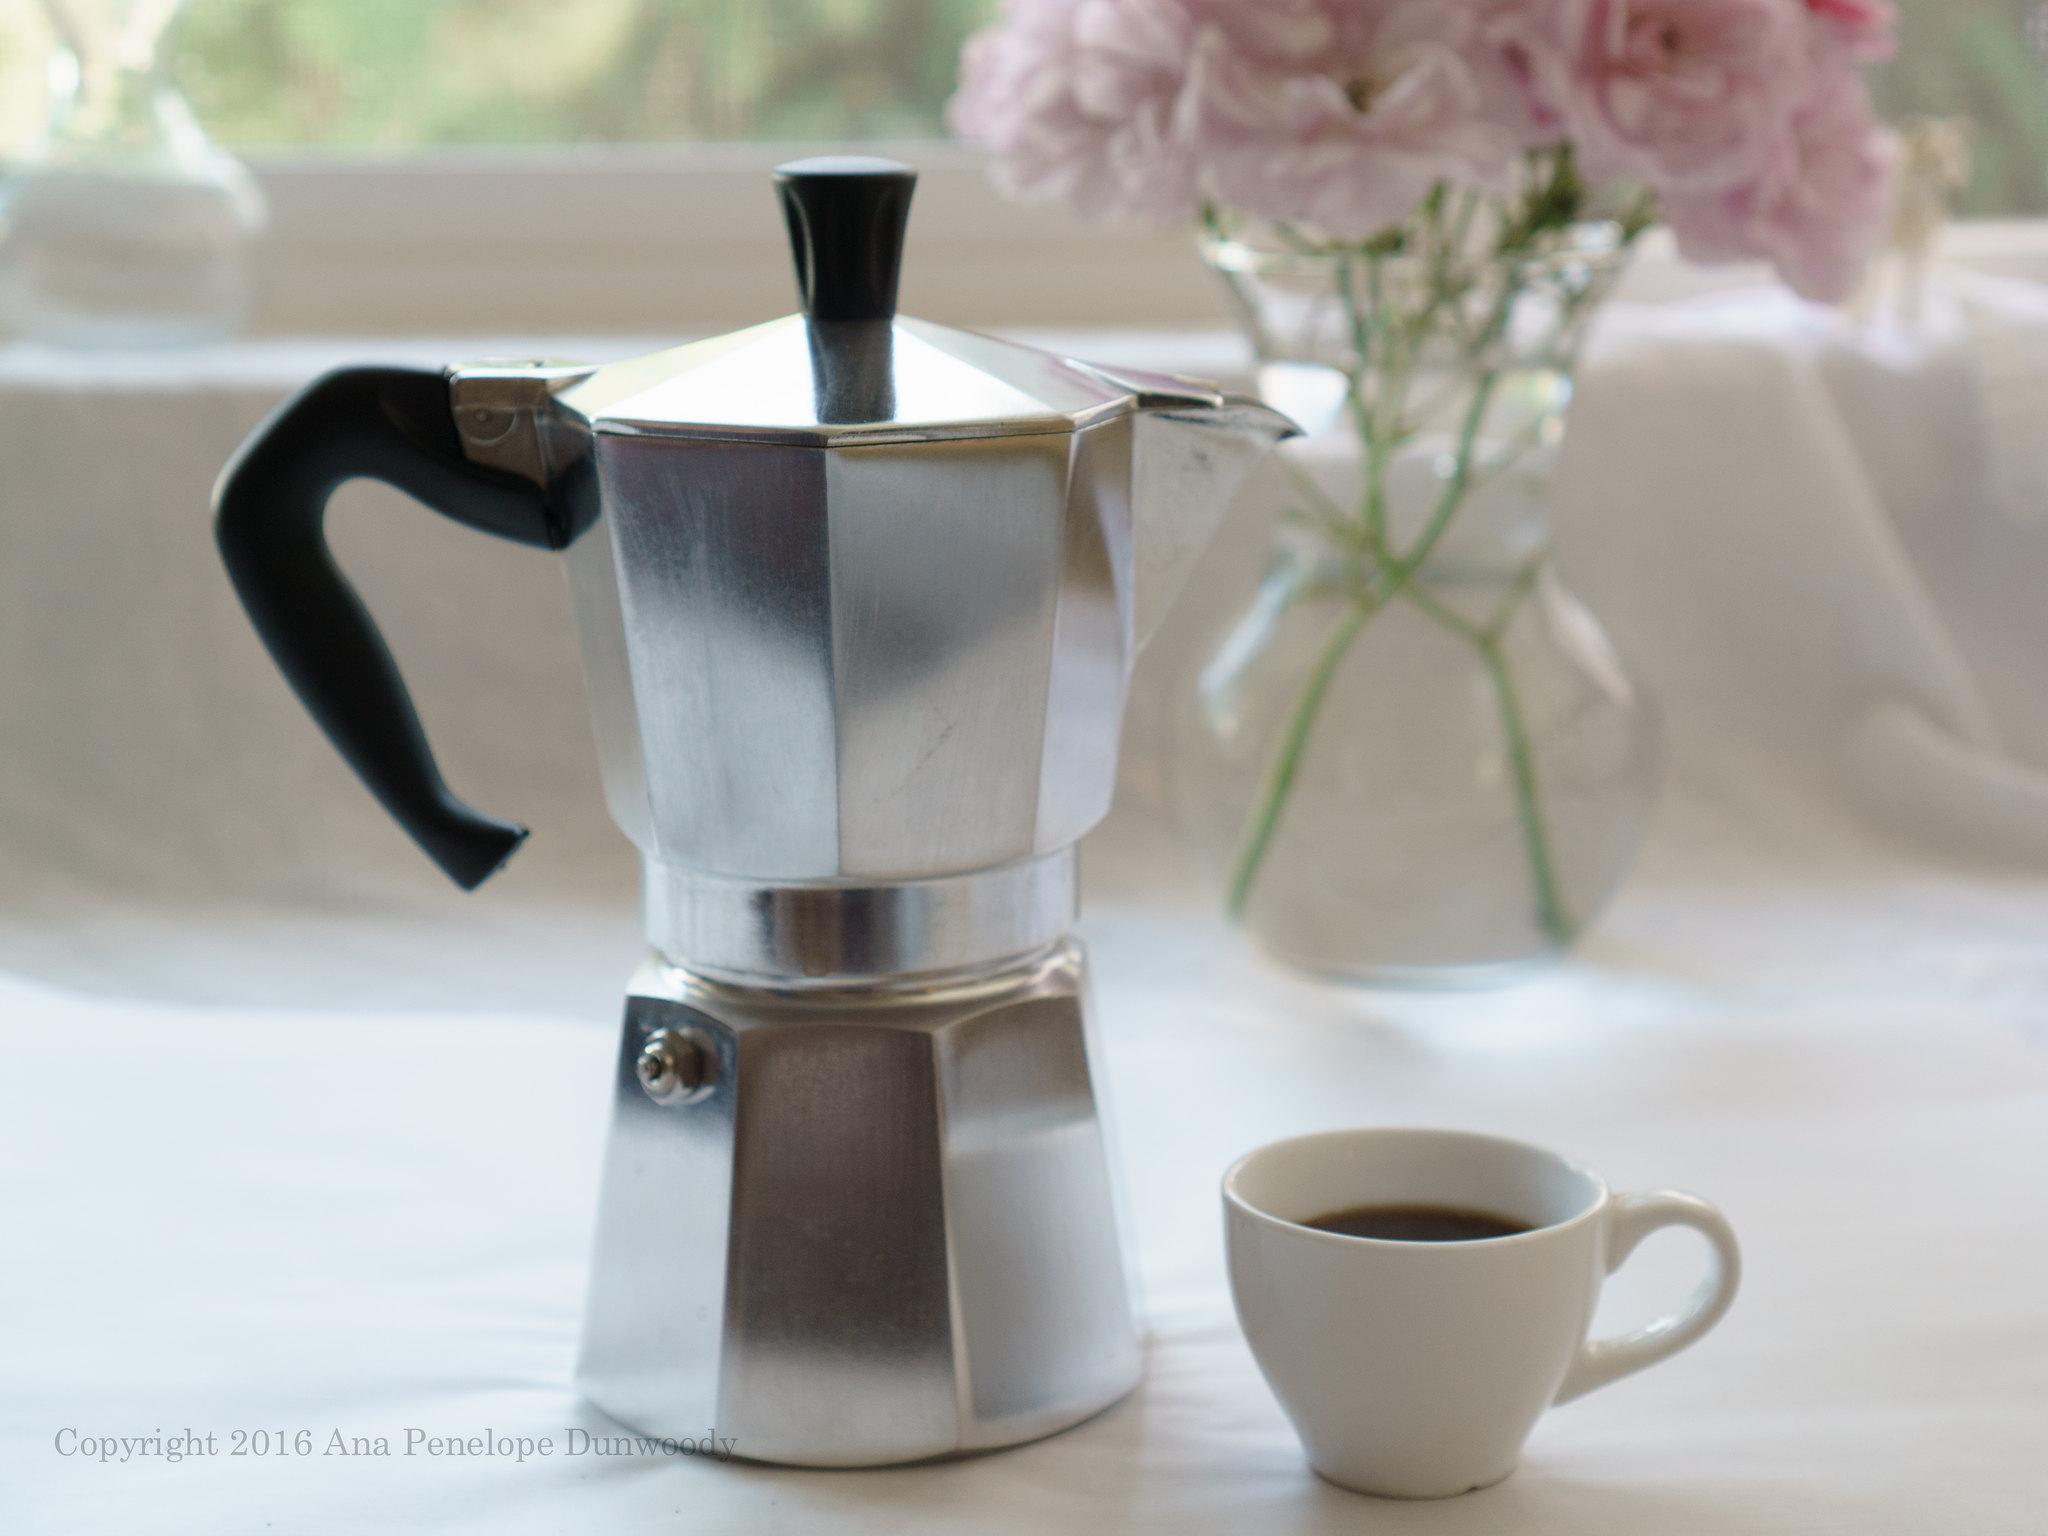 53/365 Moka Coffee